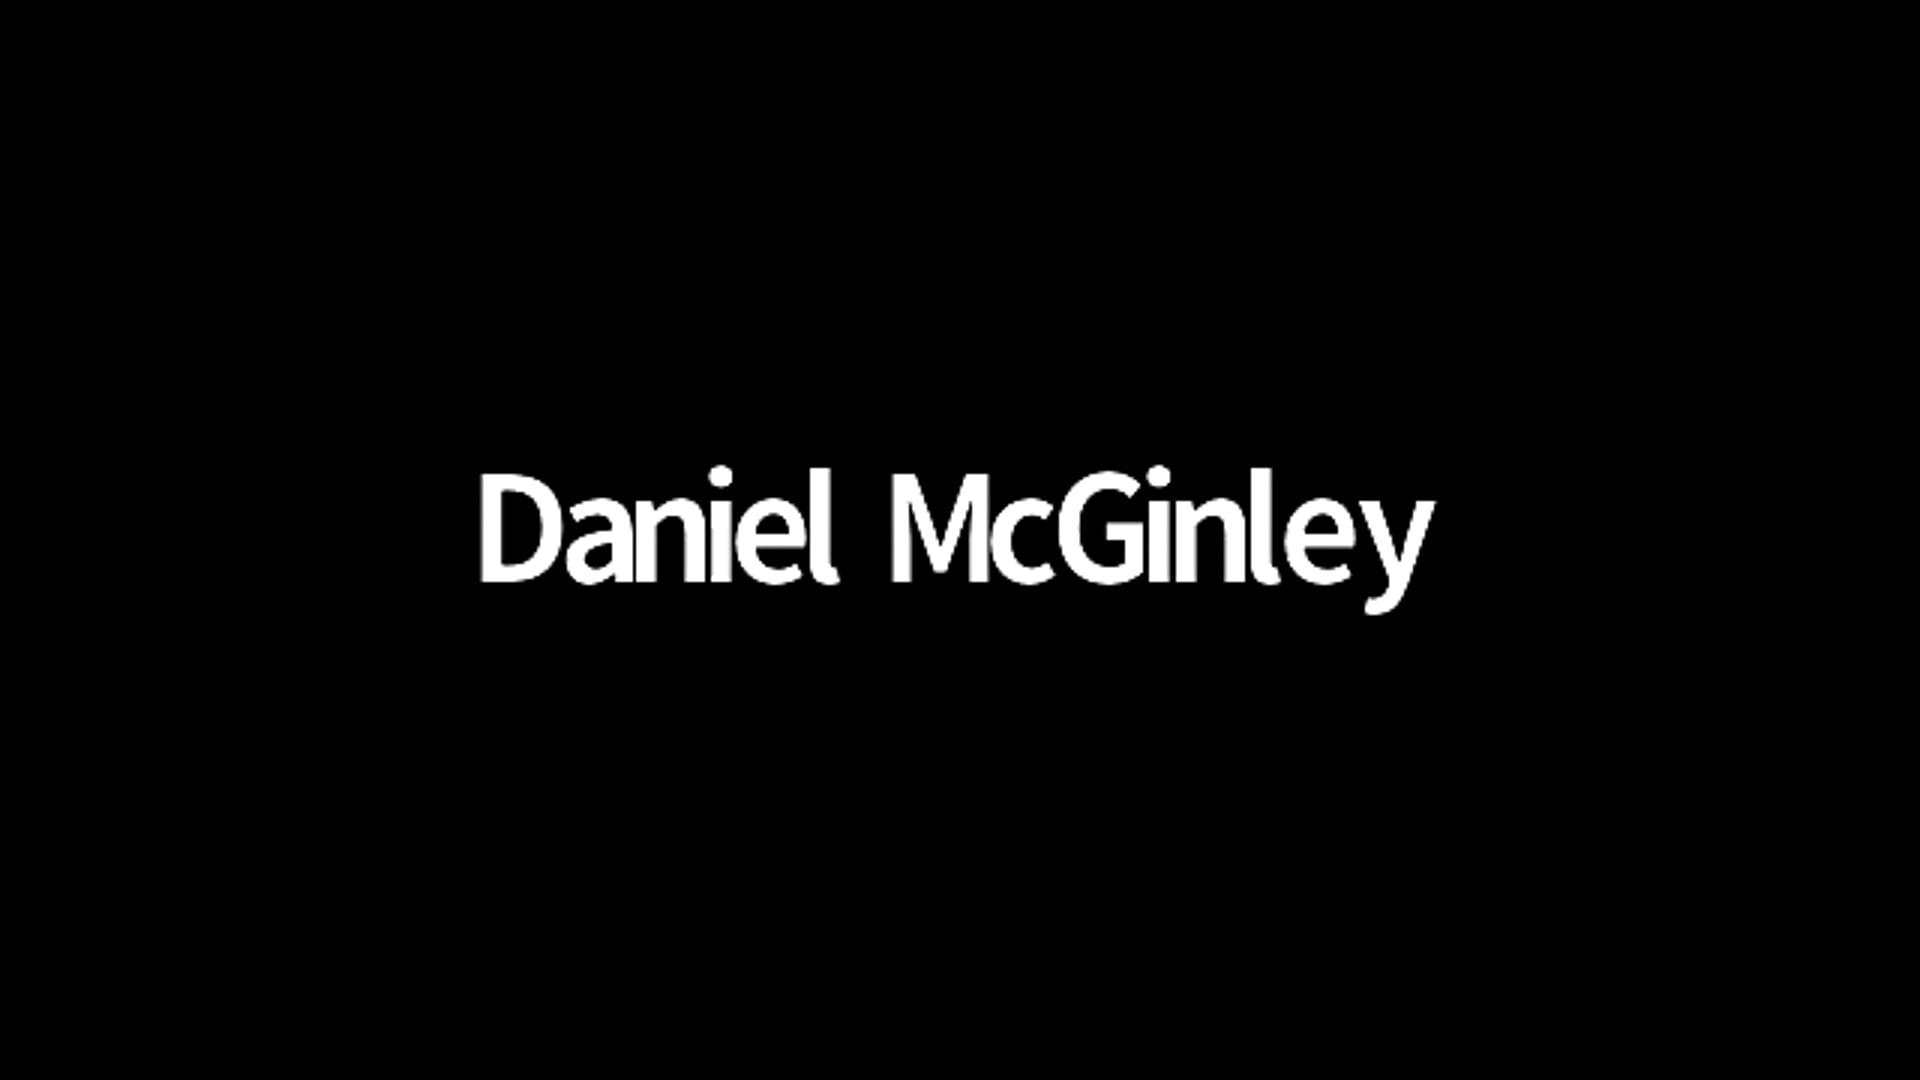 9/20/2021 8:59am Video Thumbnail